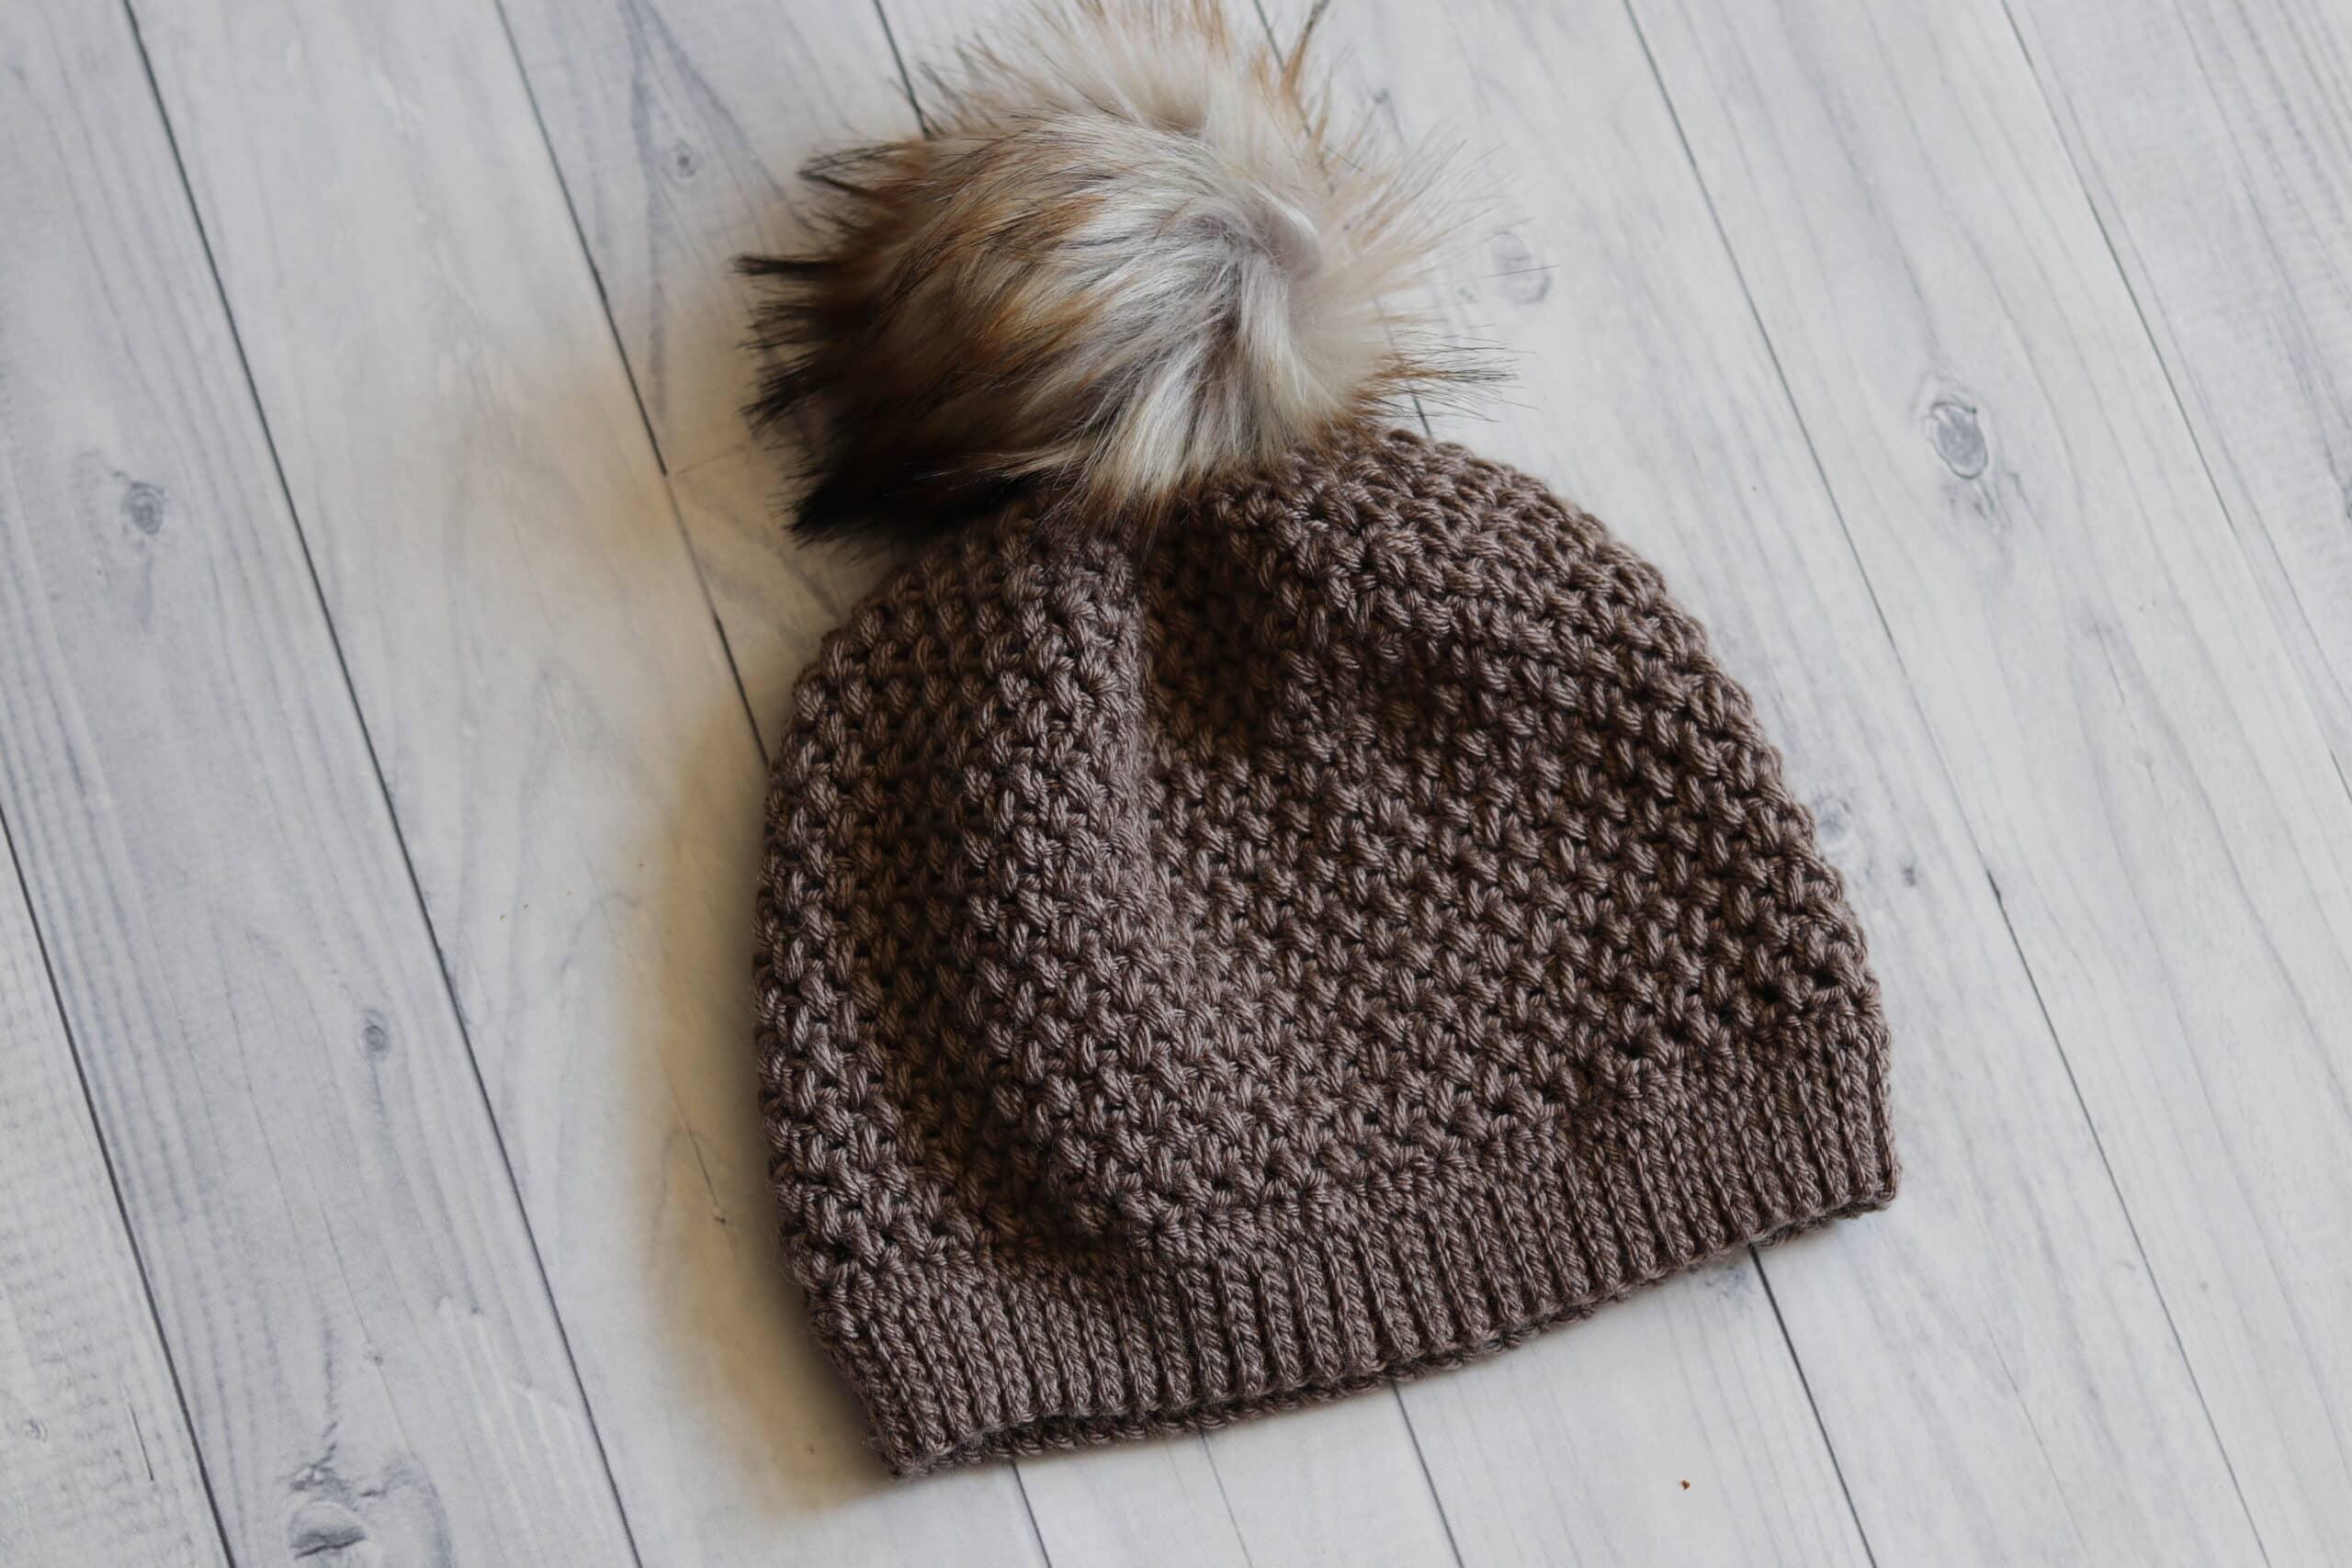 textured crochet hat Patons Canadiana Yarn